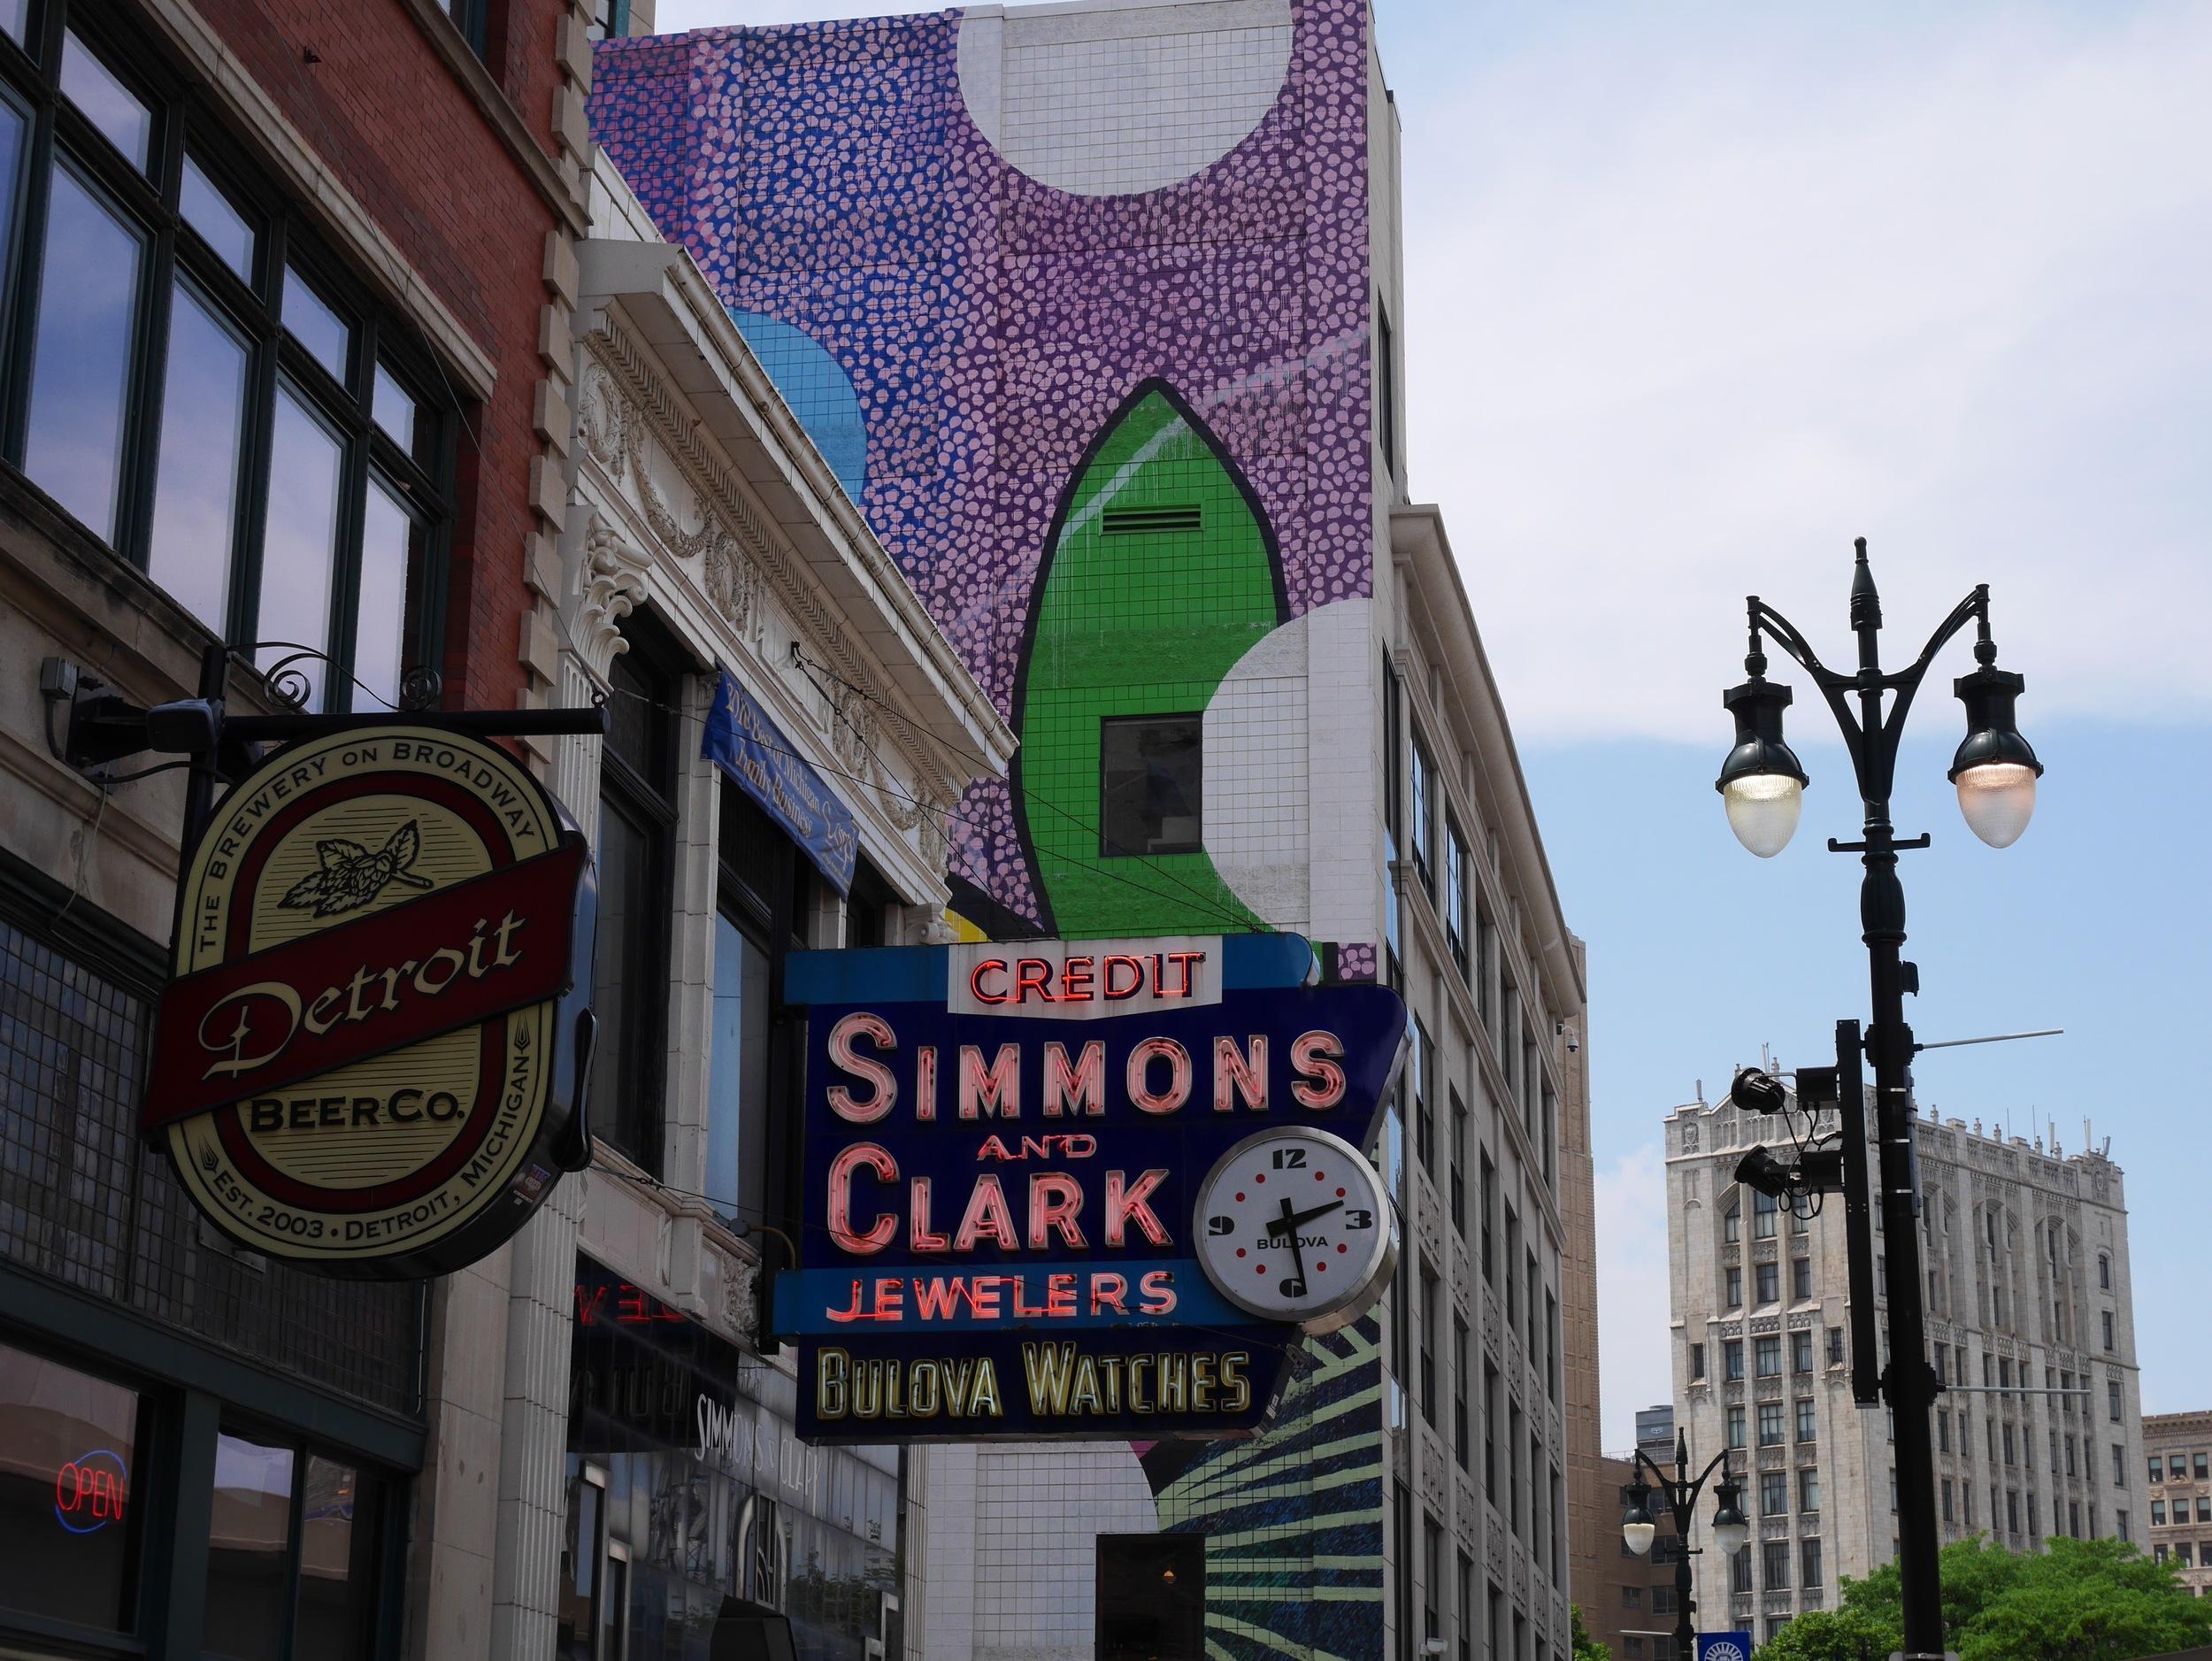 Take in the street art